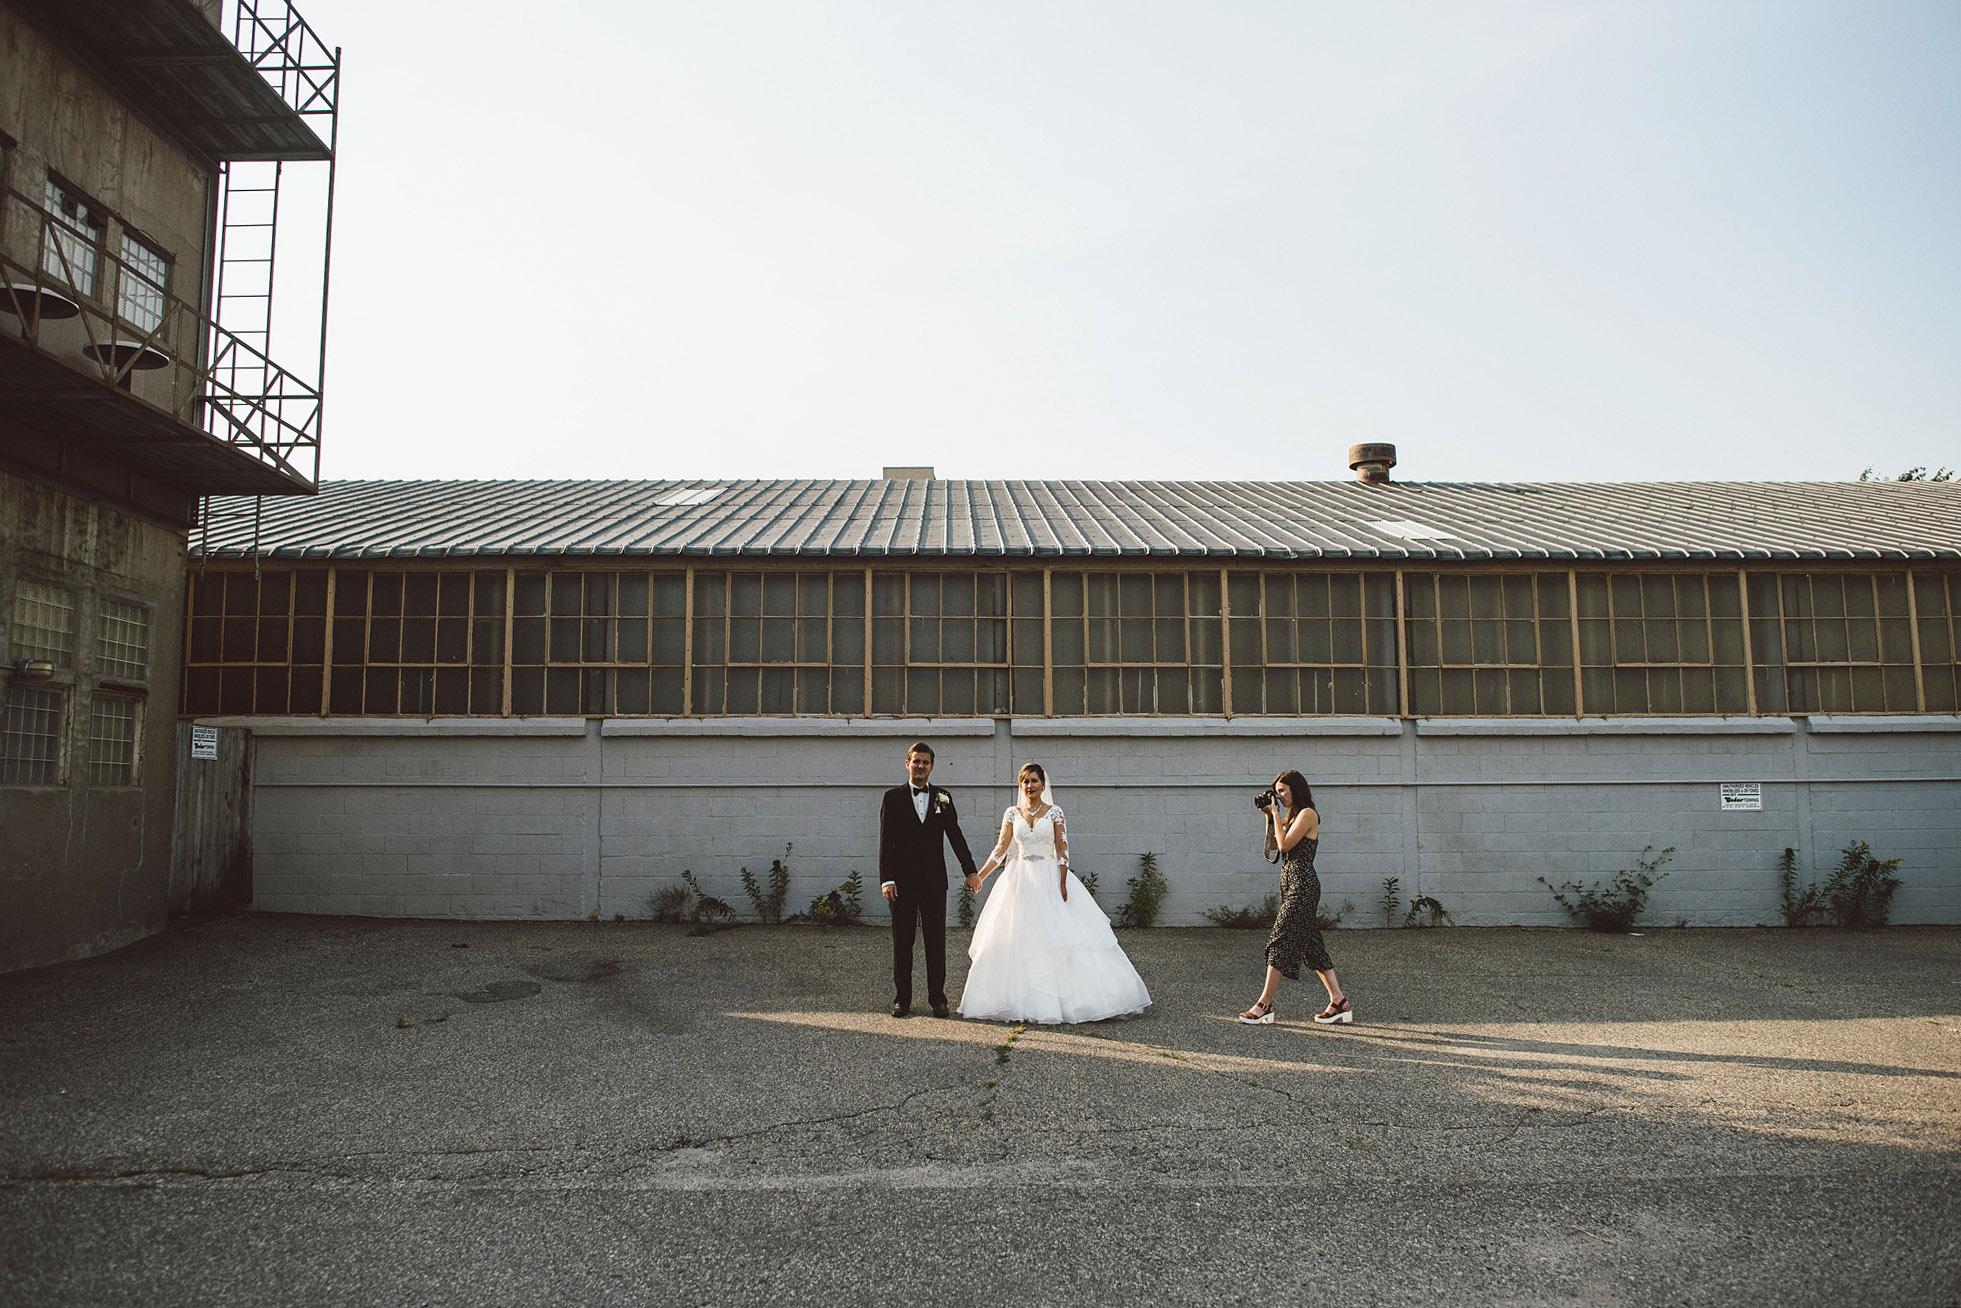 best_wedding_photography_2017_by_lucas_botz_photography_094.jpg